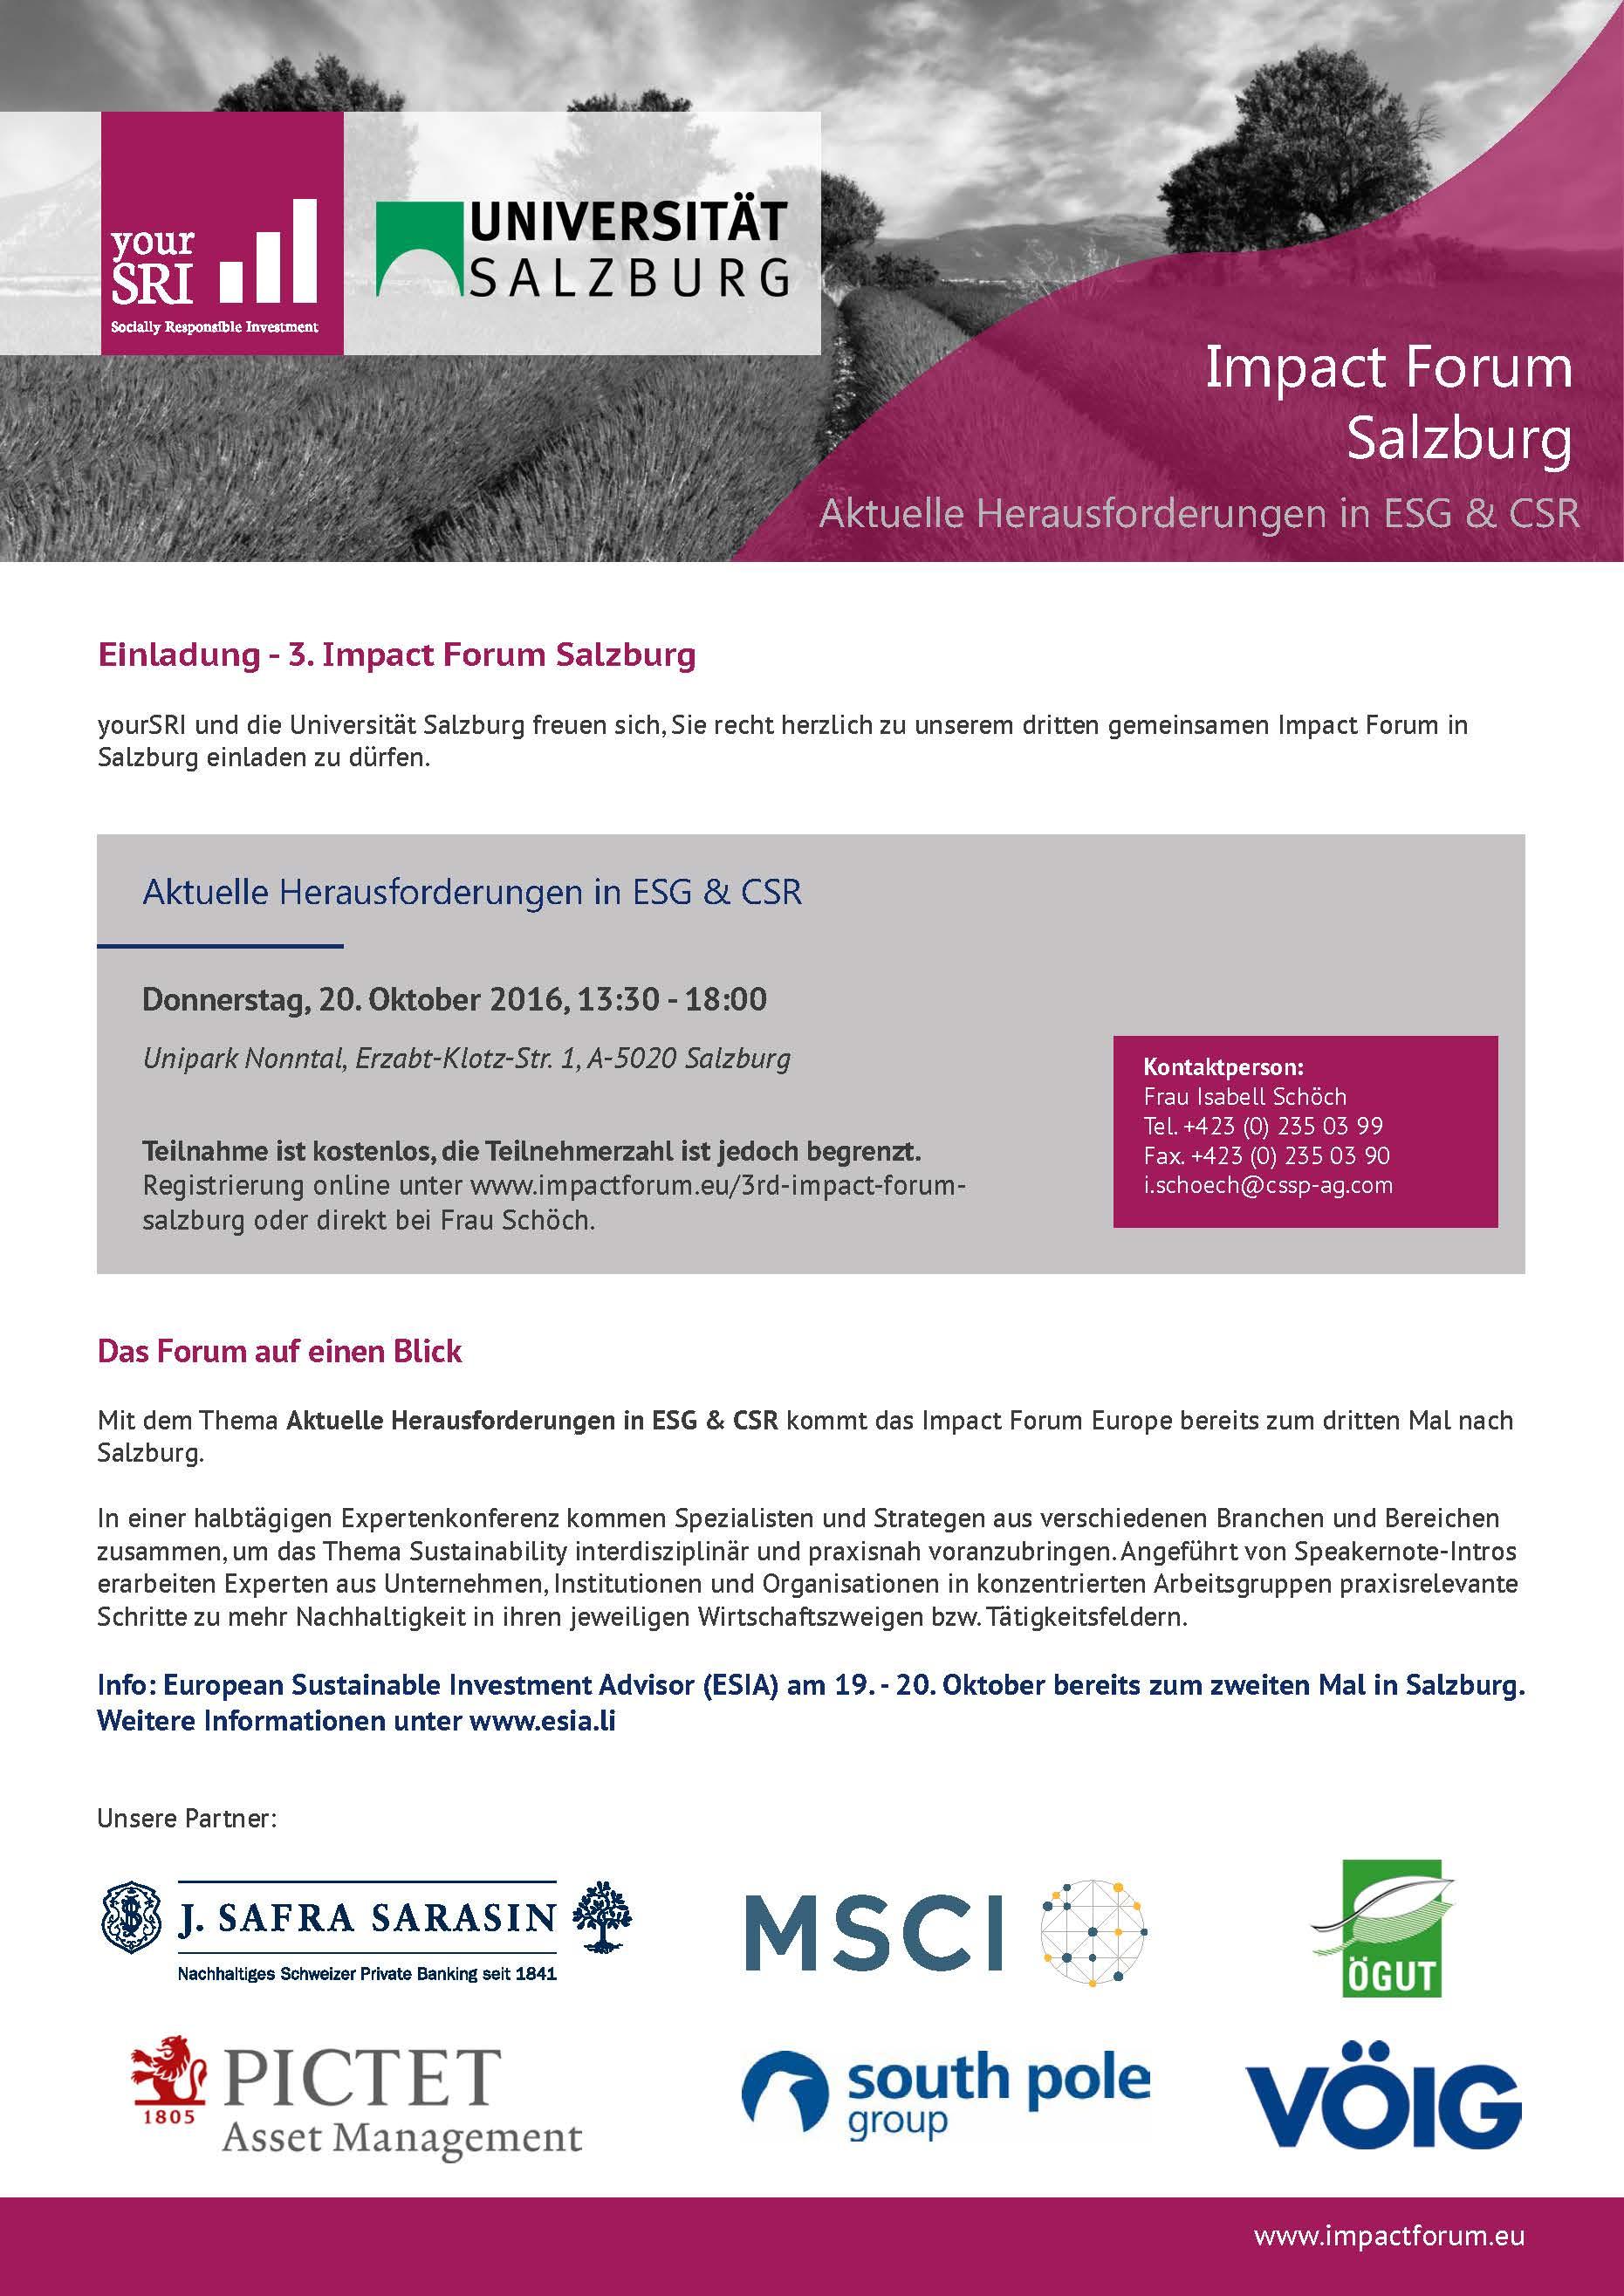 Impact Forum Salzburg V2